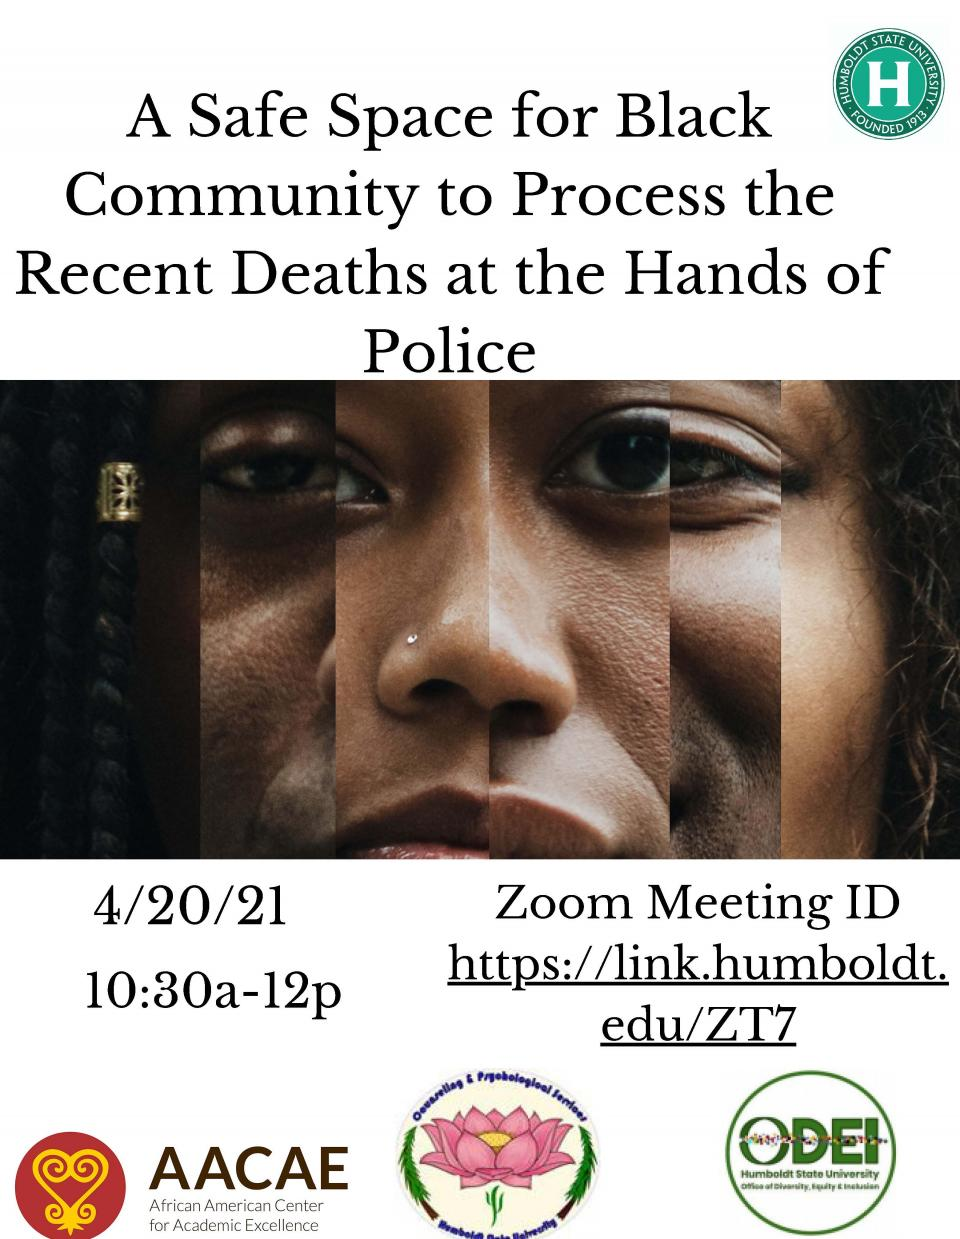 Flyer for Black Community Event on 4/20